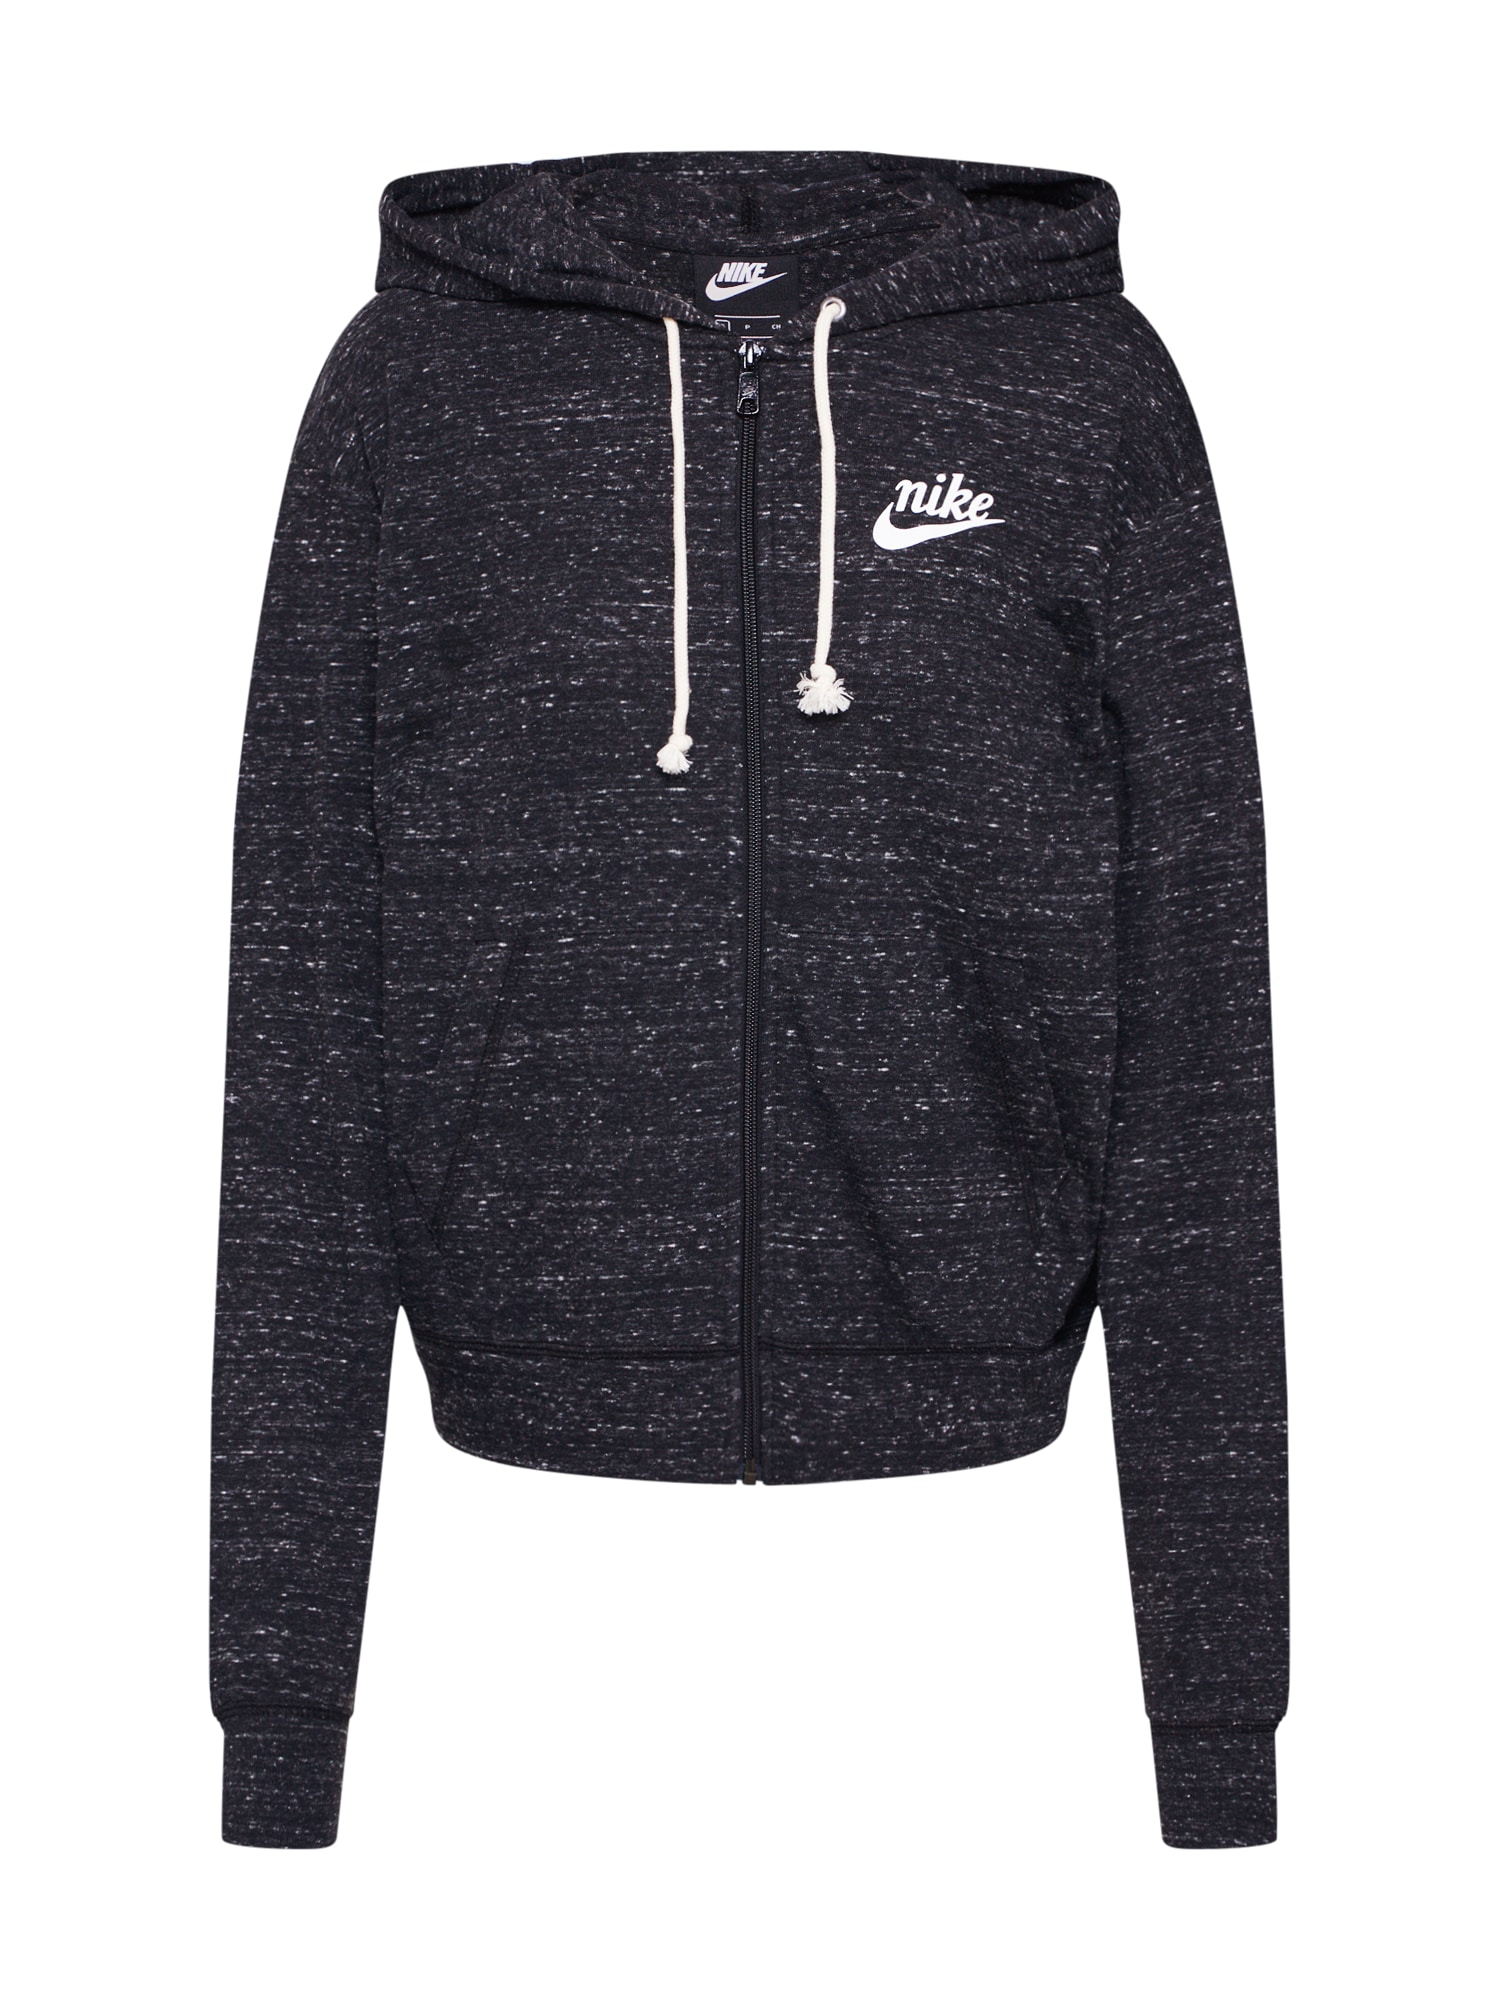 Nike Sportswear Džemperis margai juoda